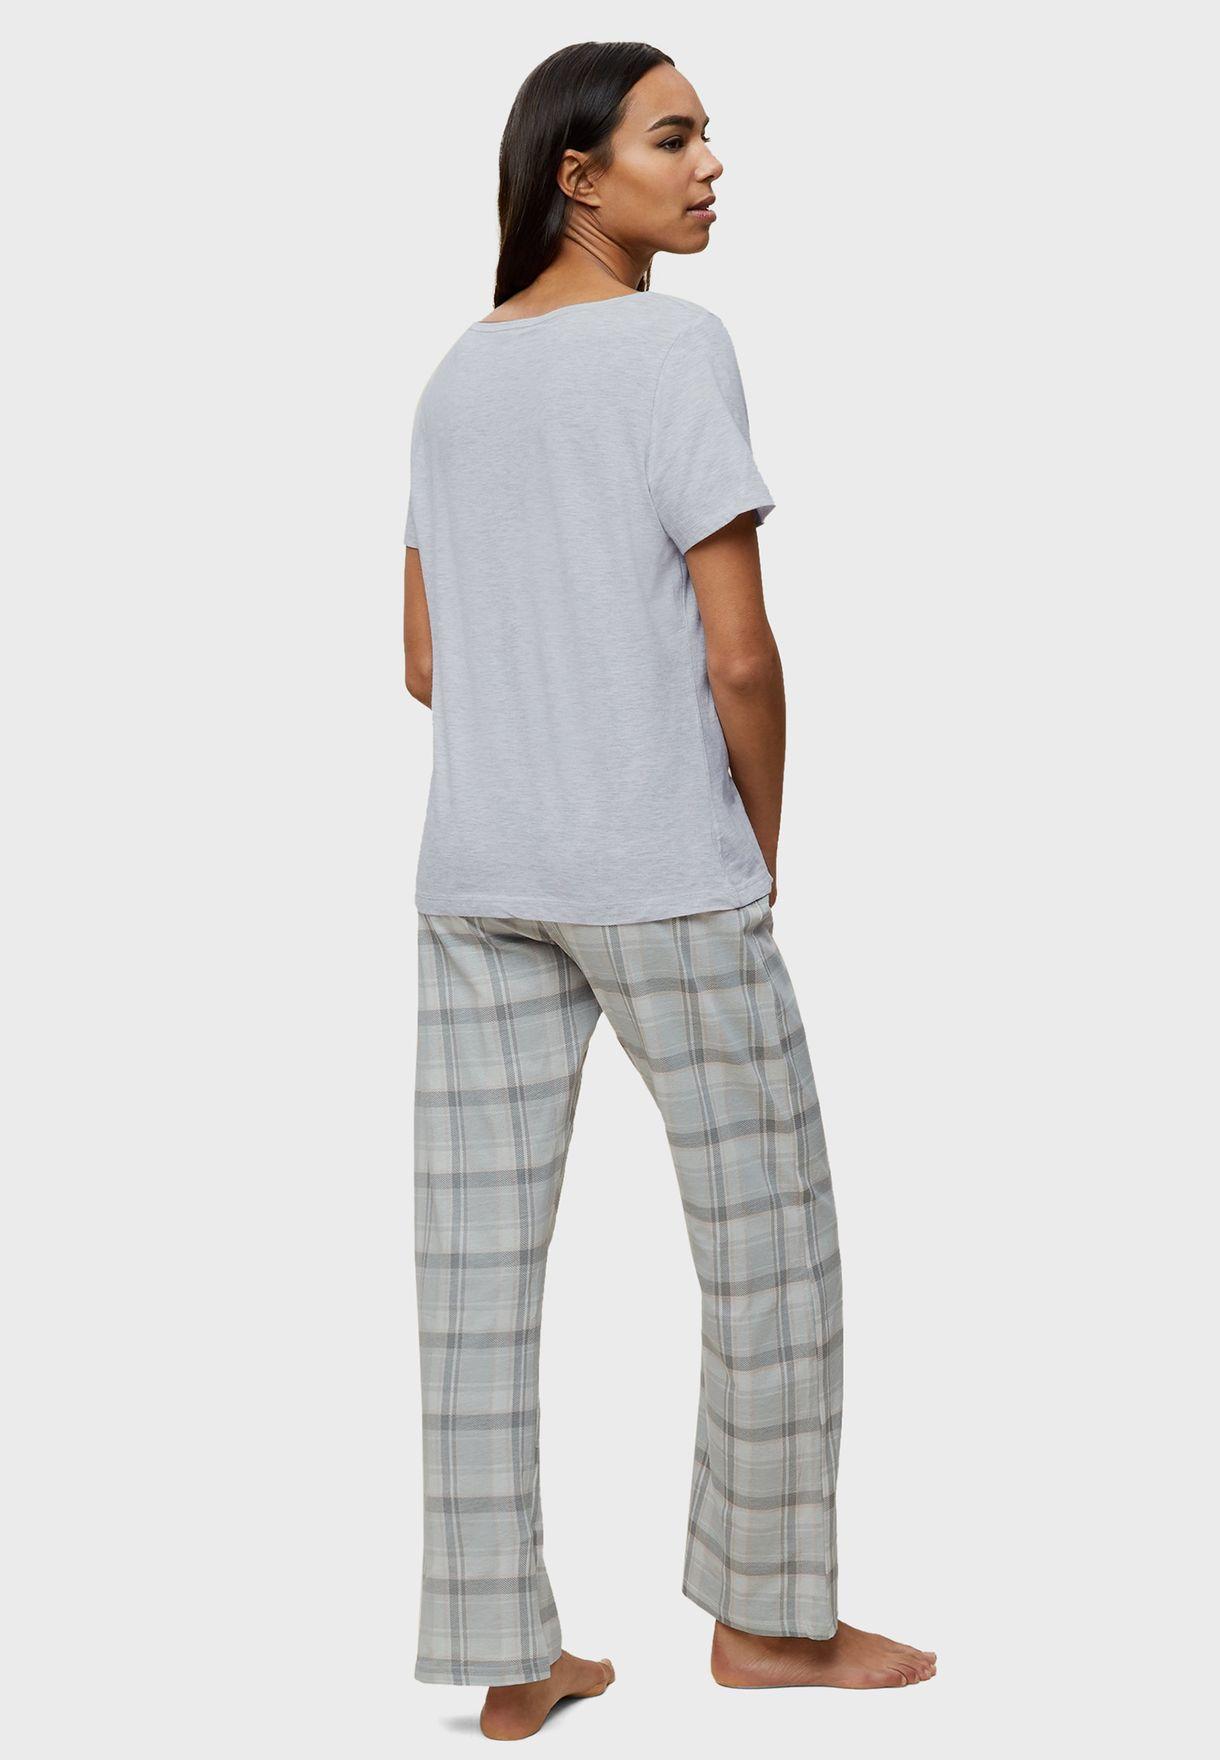 Sloth Printed Pyjama Set